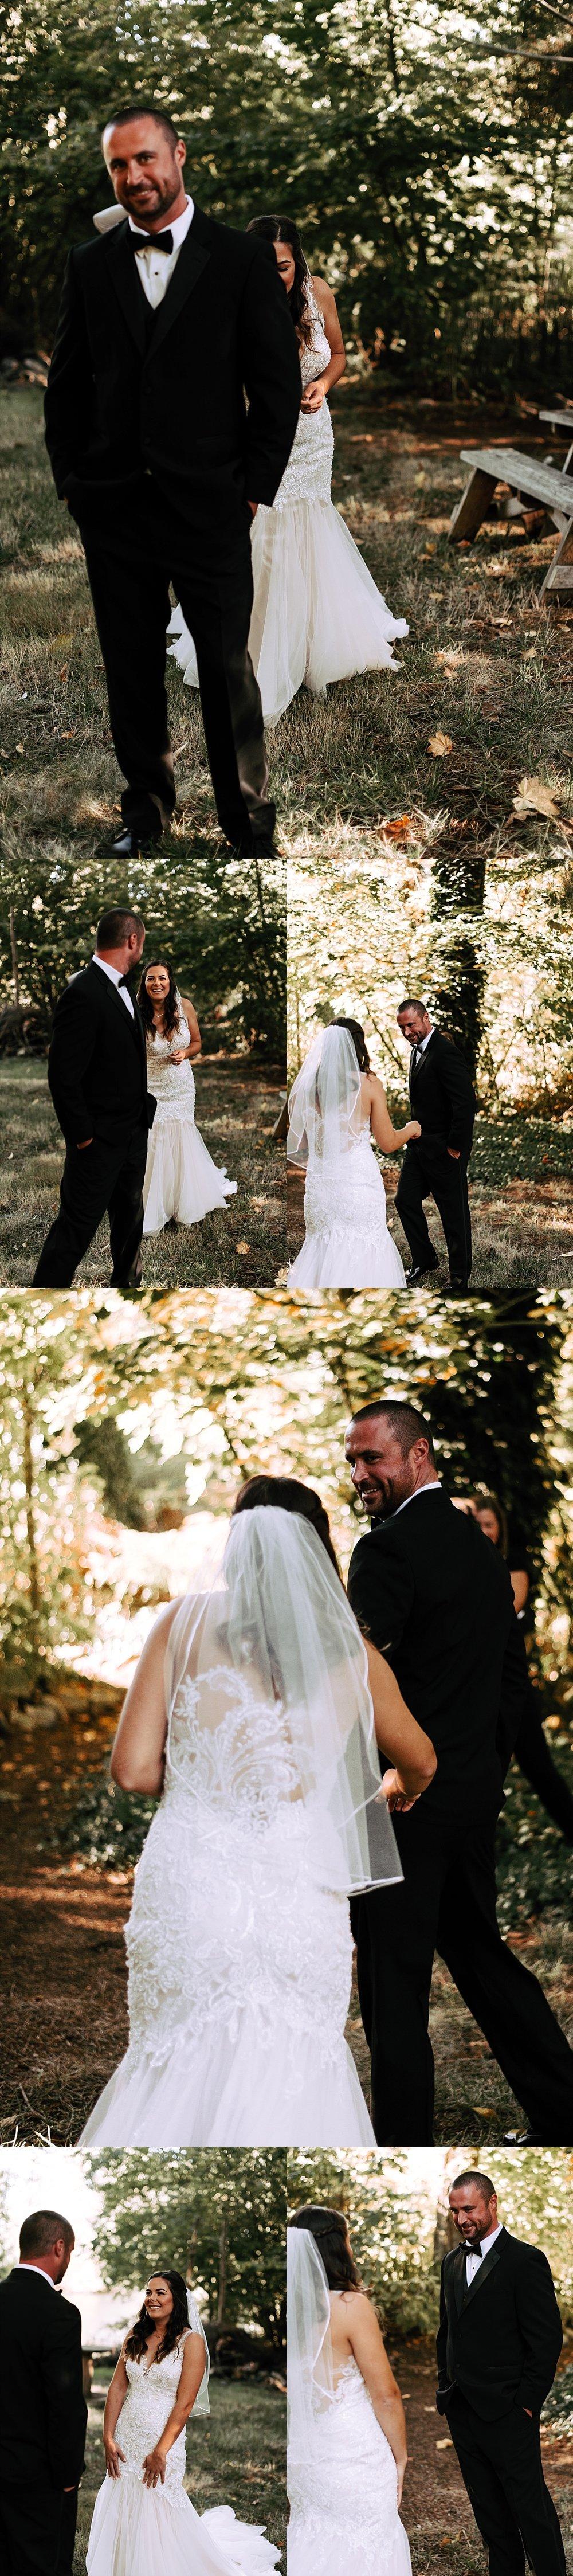 romantic backyard wedding_0015.jpg